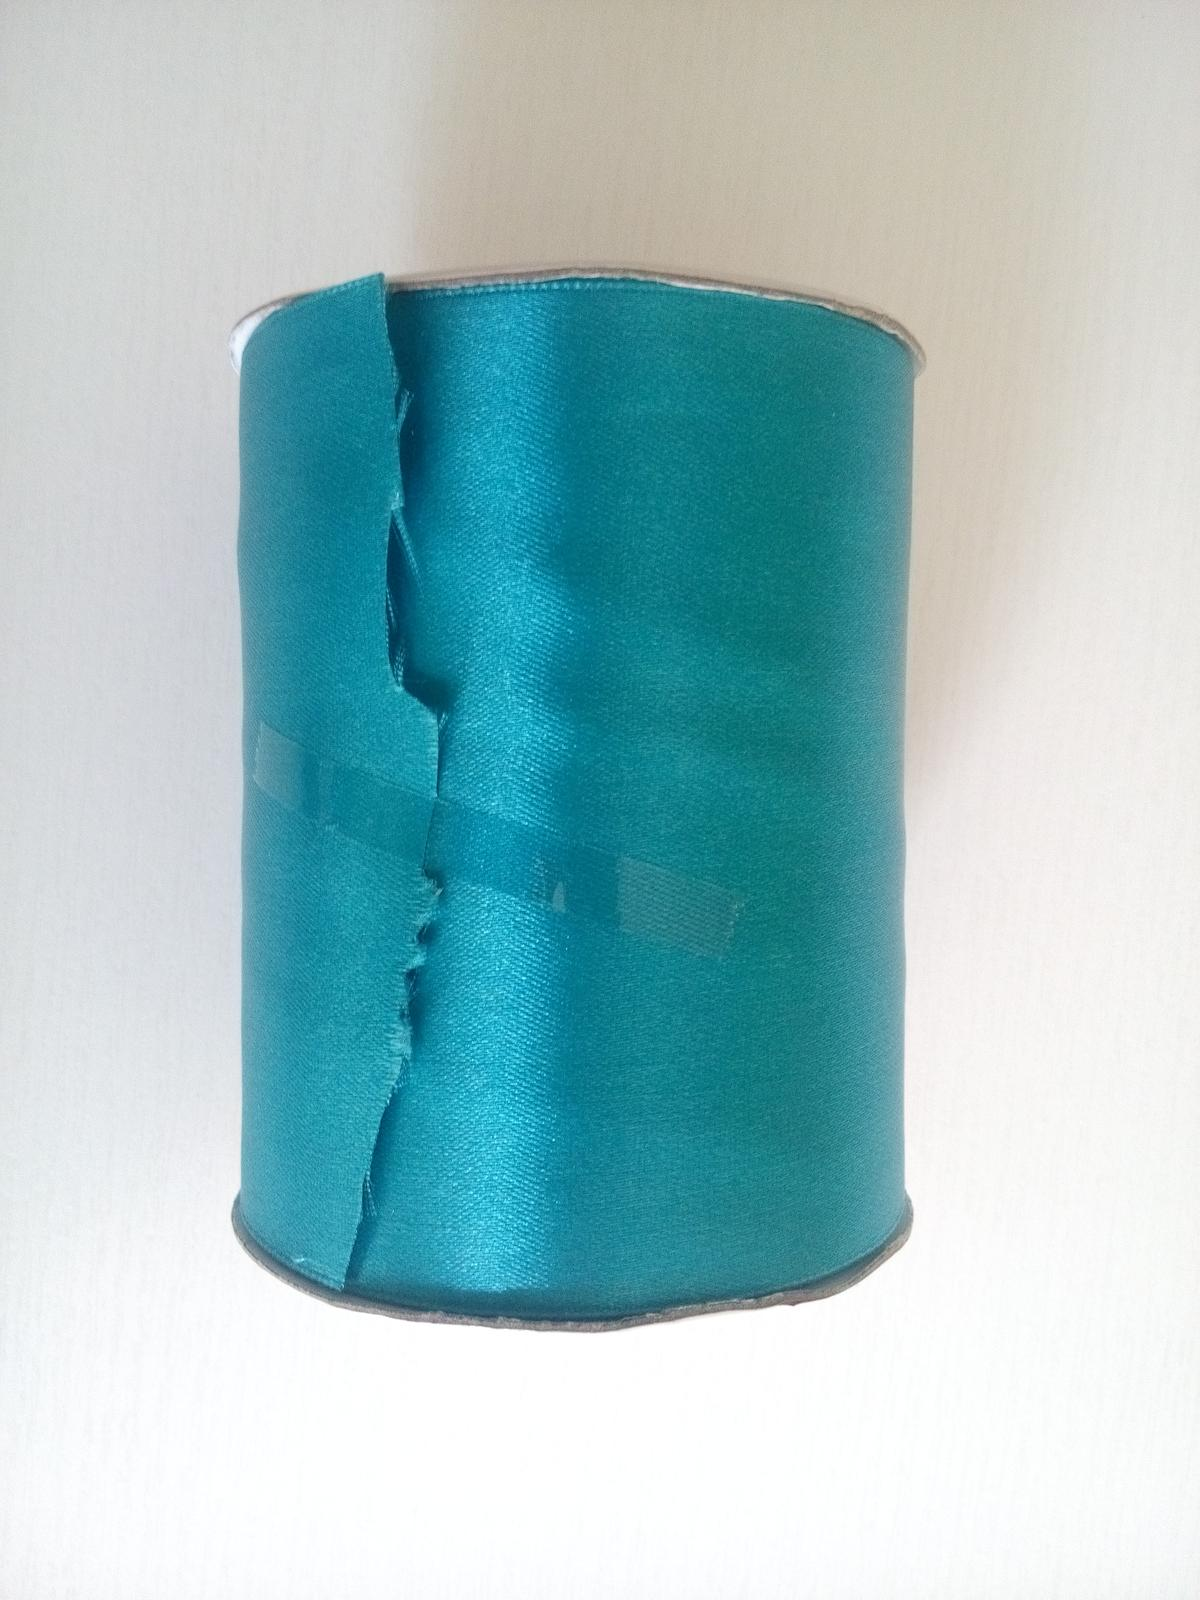 Stuha satén tmavá tyrkysová - Obrázek č. 1